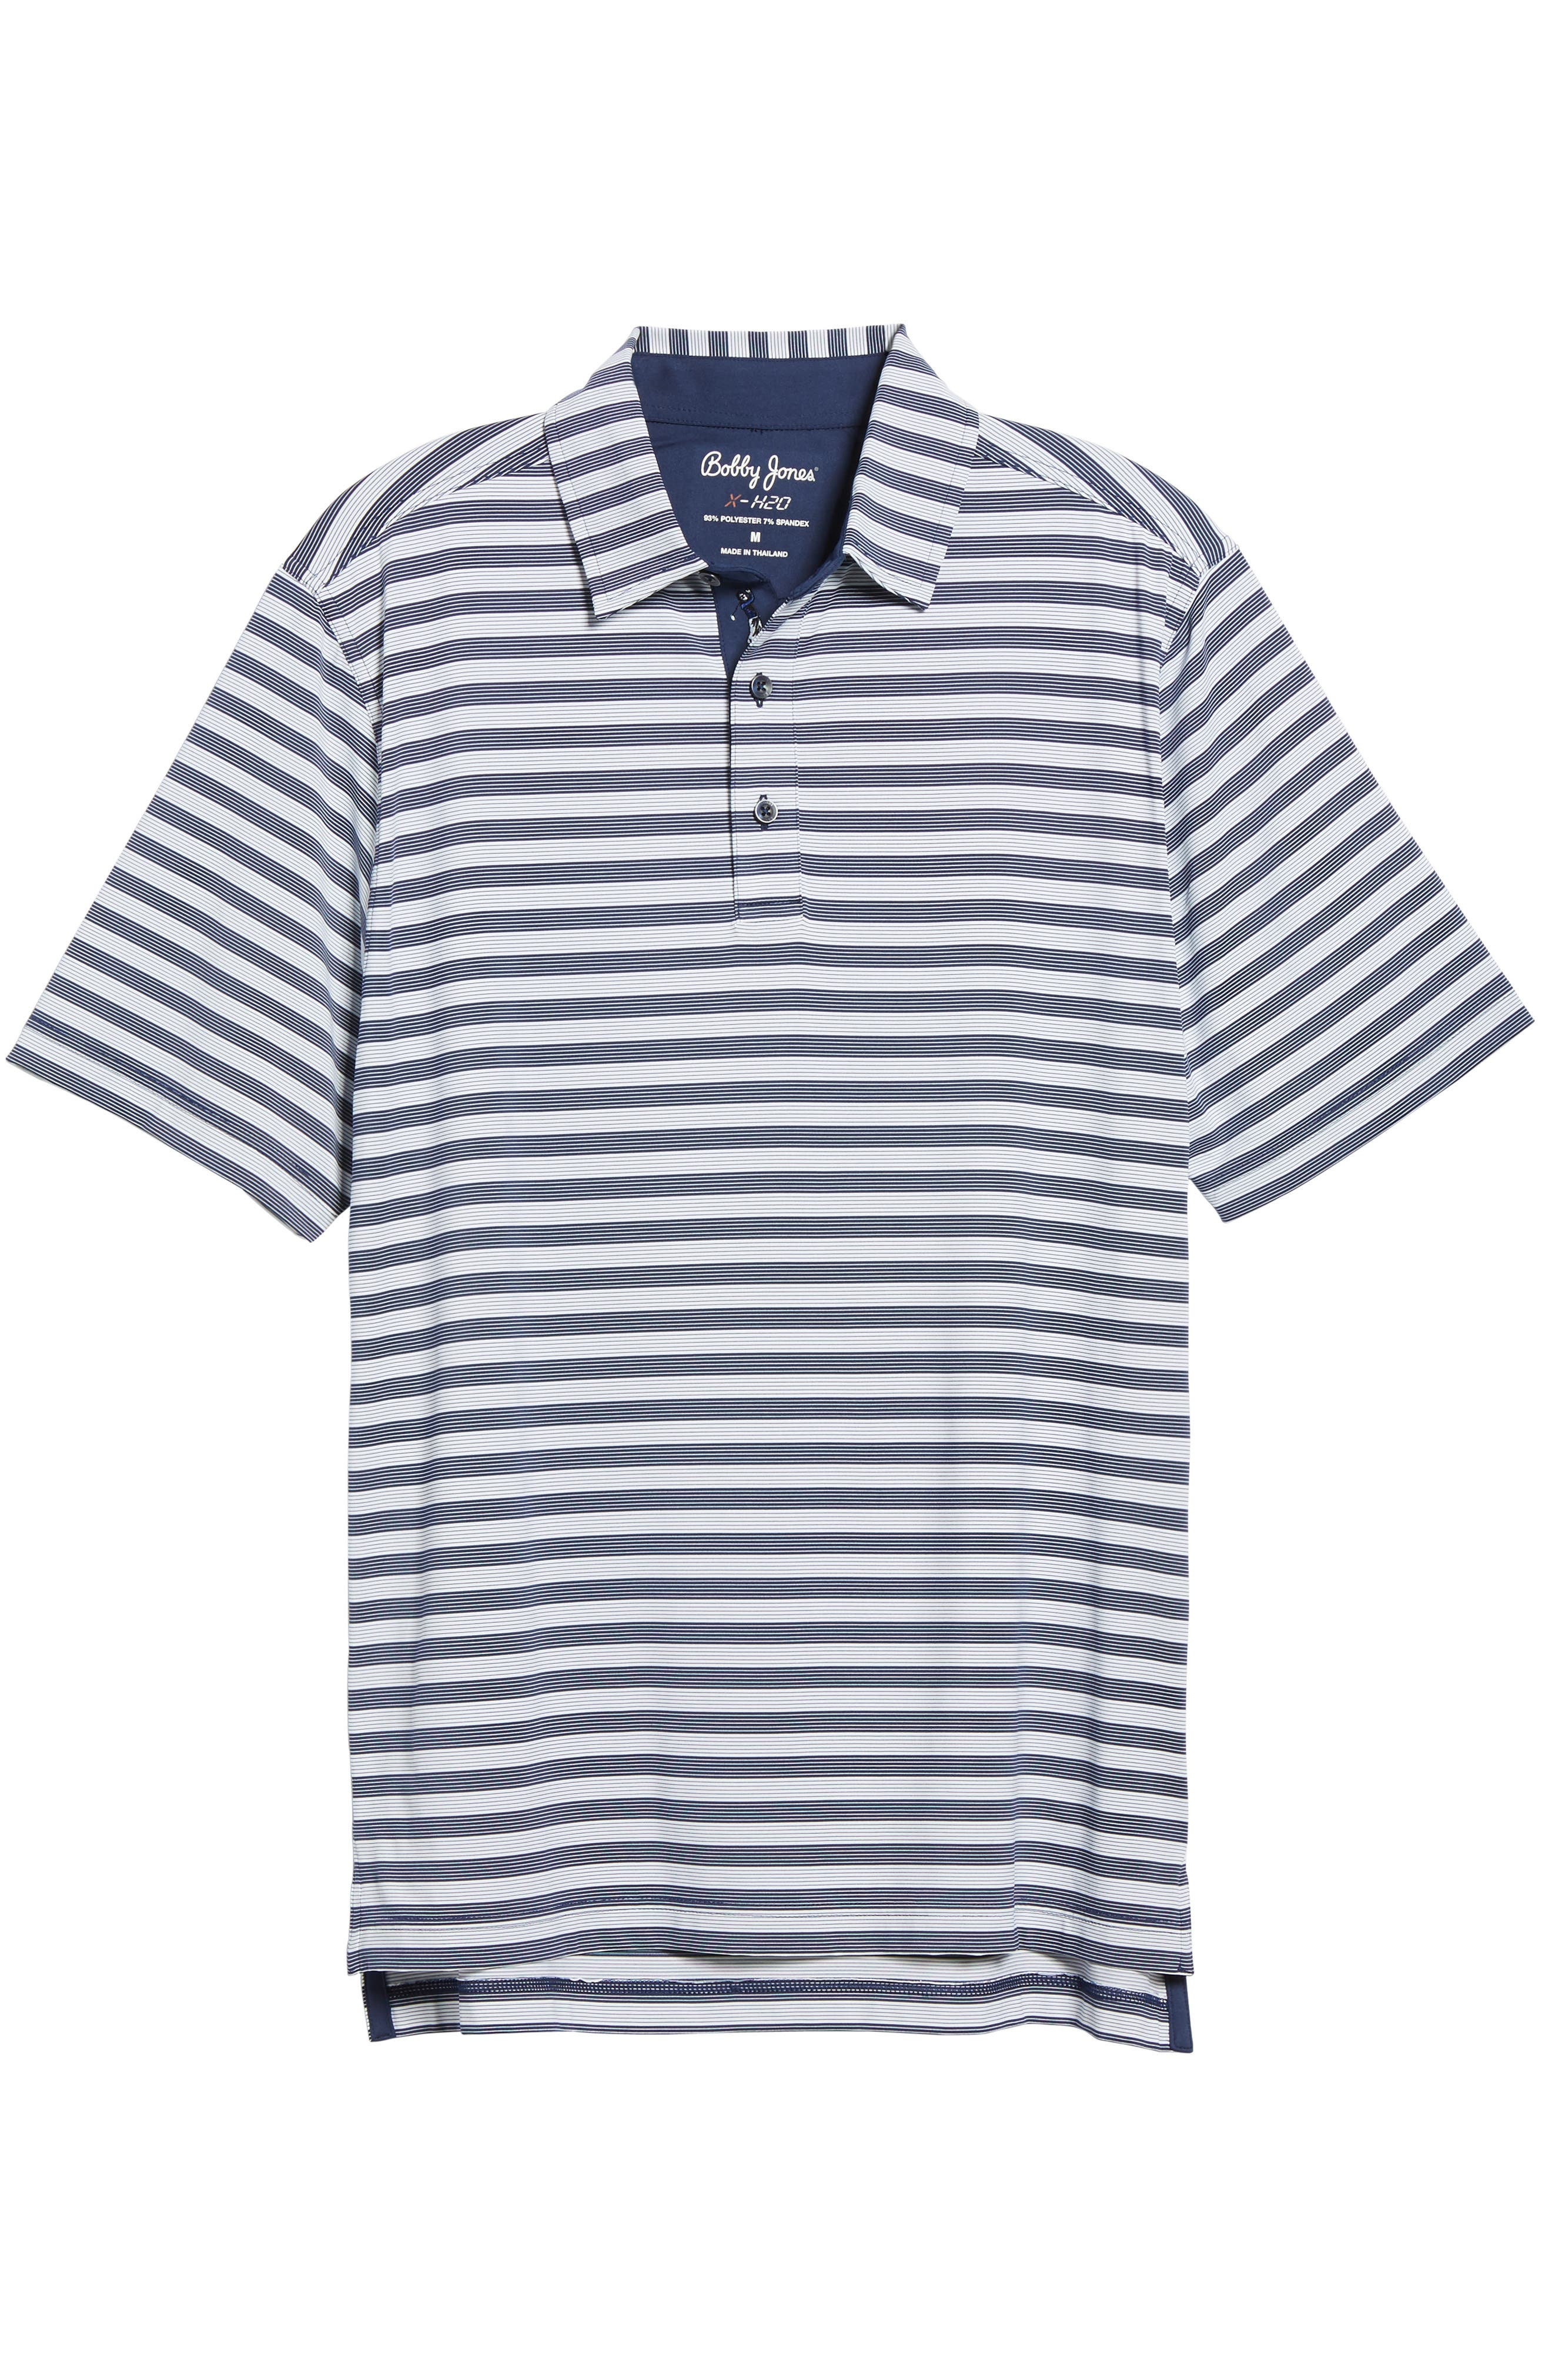 XH2O Del Mar Stripe Jersey Polo,                             Alternate thumbnail 6, color,                             Summer Navy